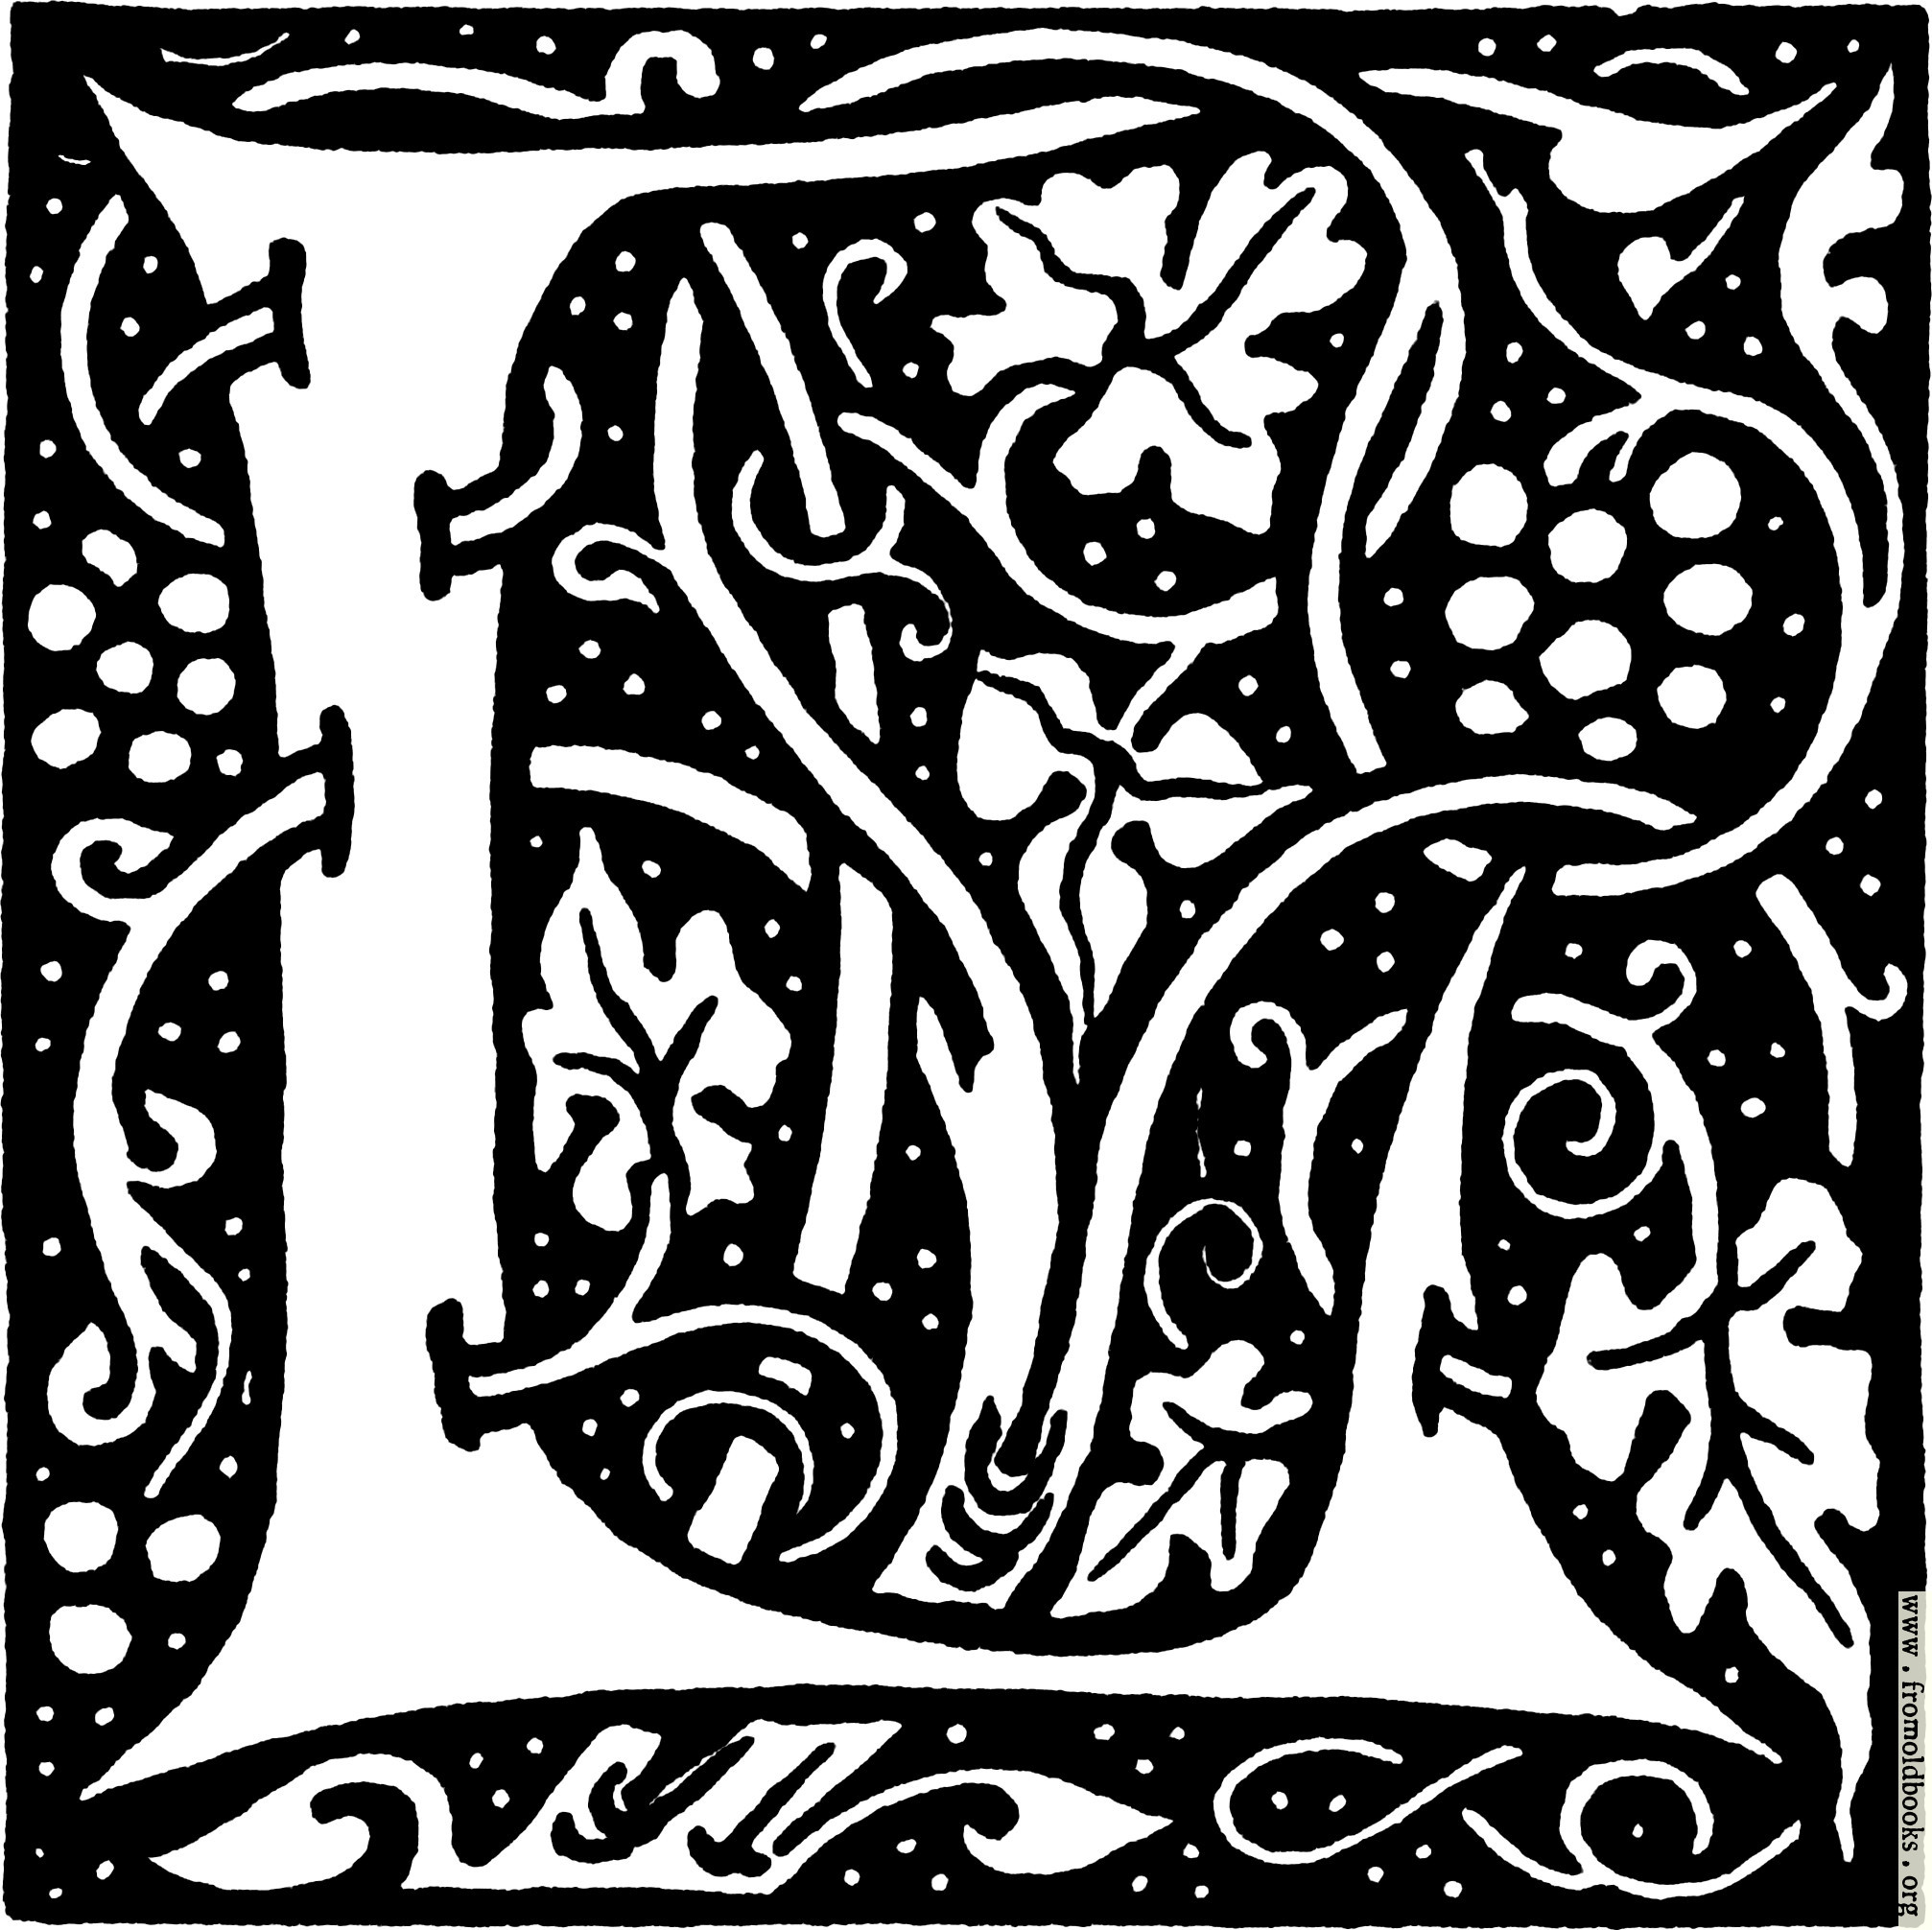 K Alphabet hd wallpaper image